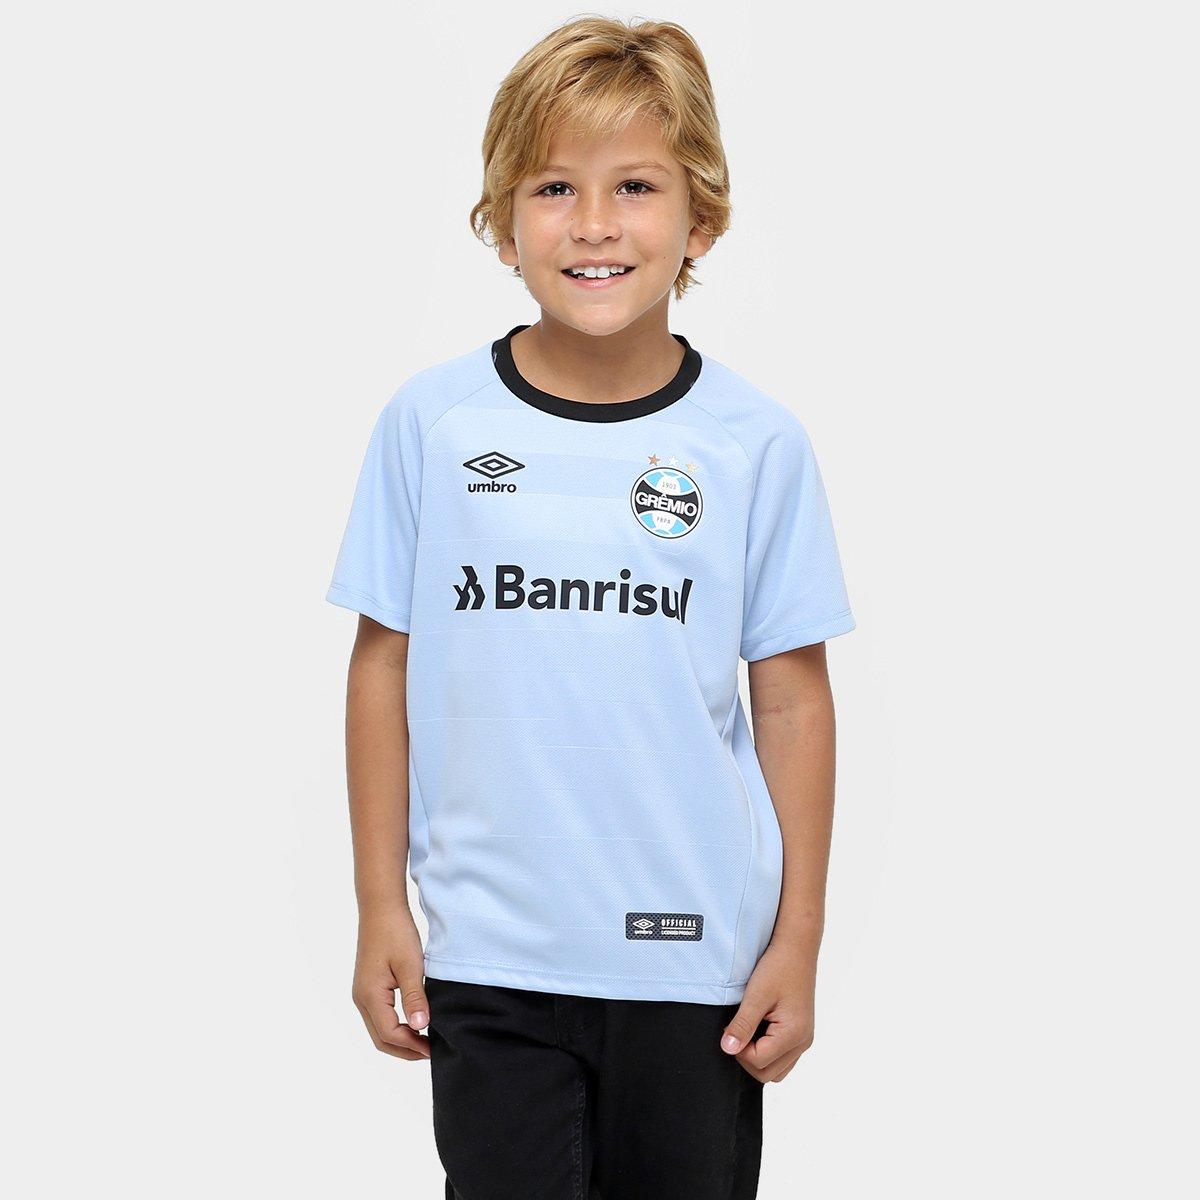 Camisa Grêmio Infantil II 17 18 nº 10 Torcedor Umbro 73ab4c52992b4